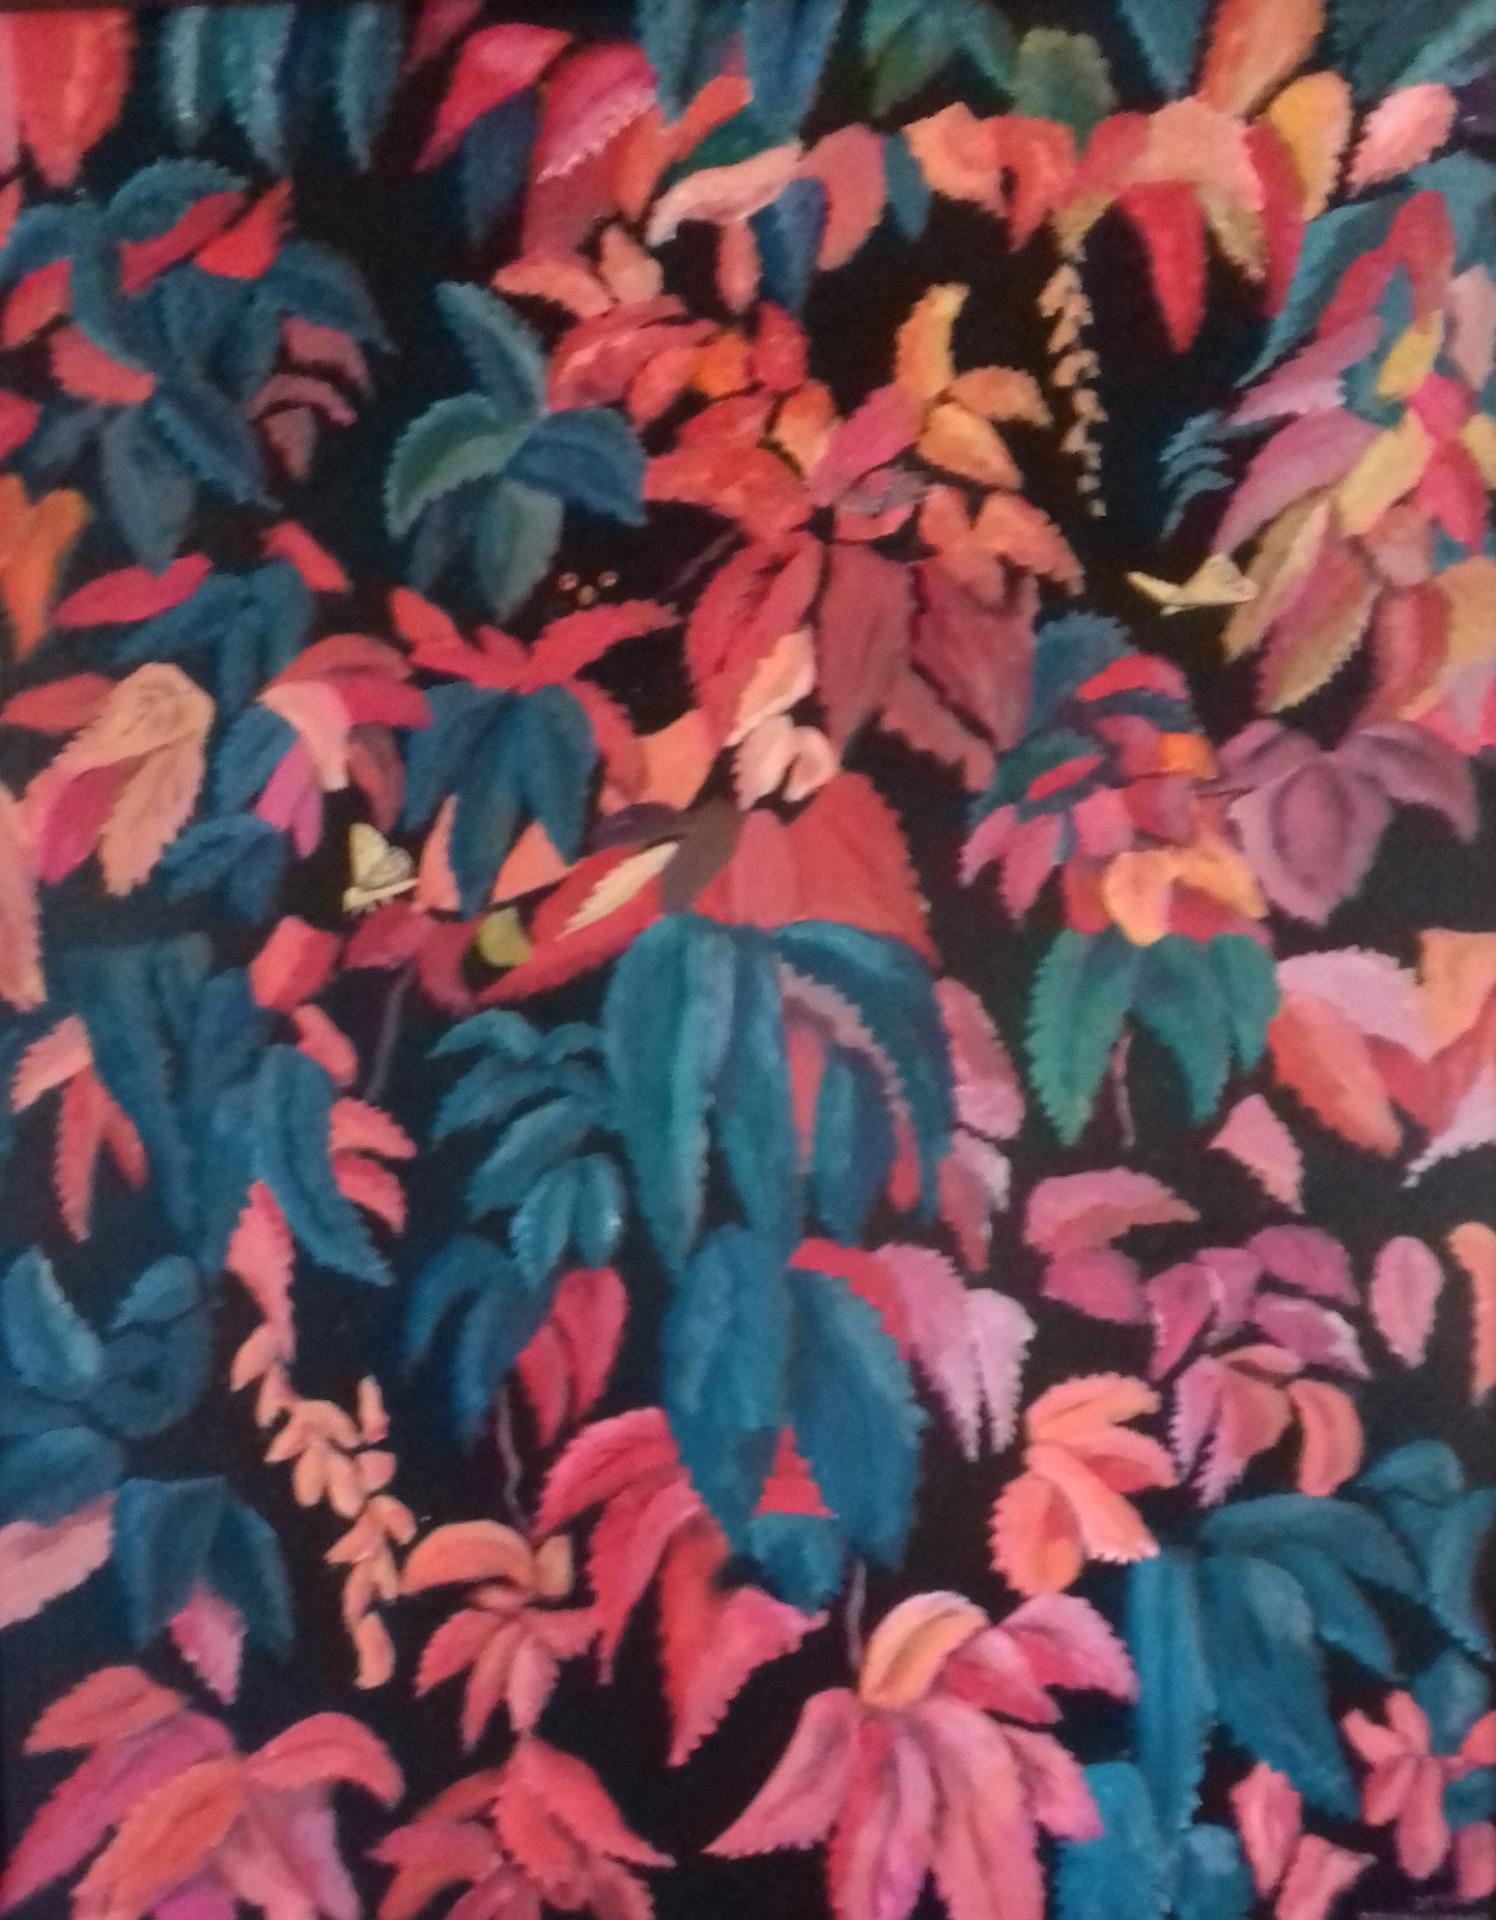 Kletterwein-2   2019   Acryl auf Leinwand   80 x 100 cm